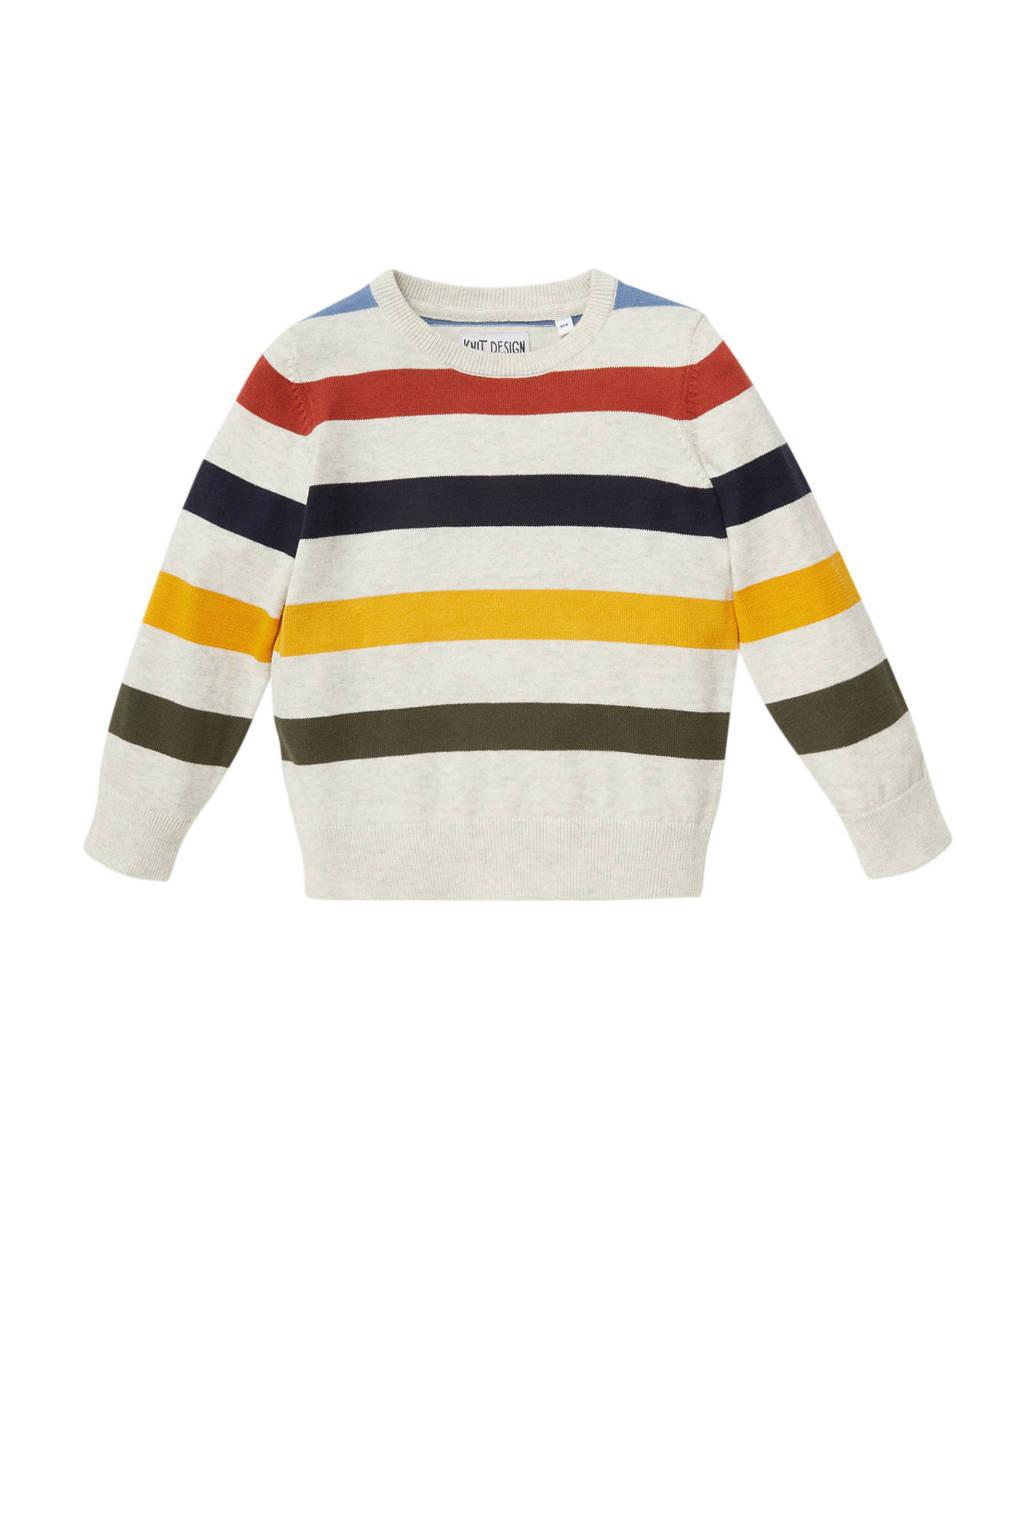 C&A gestreepte trui multicolor, Multicolor